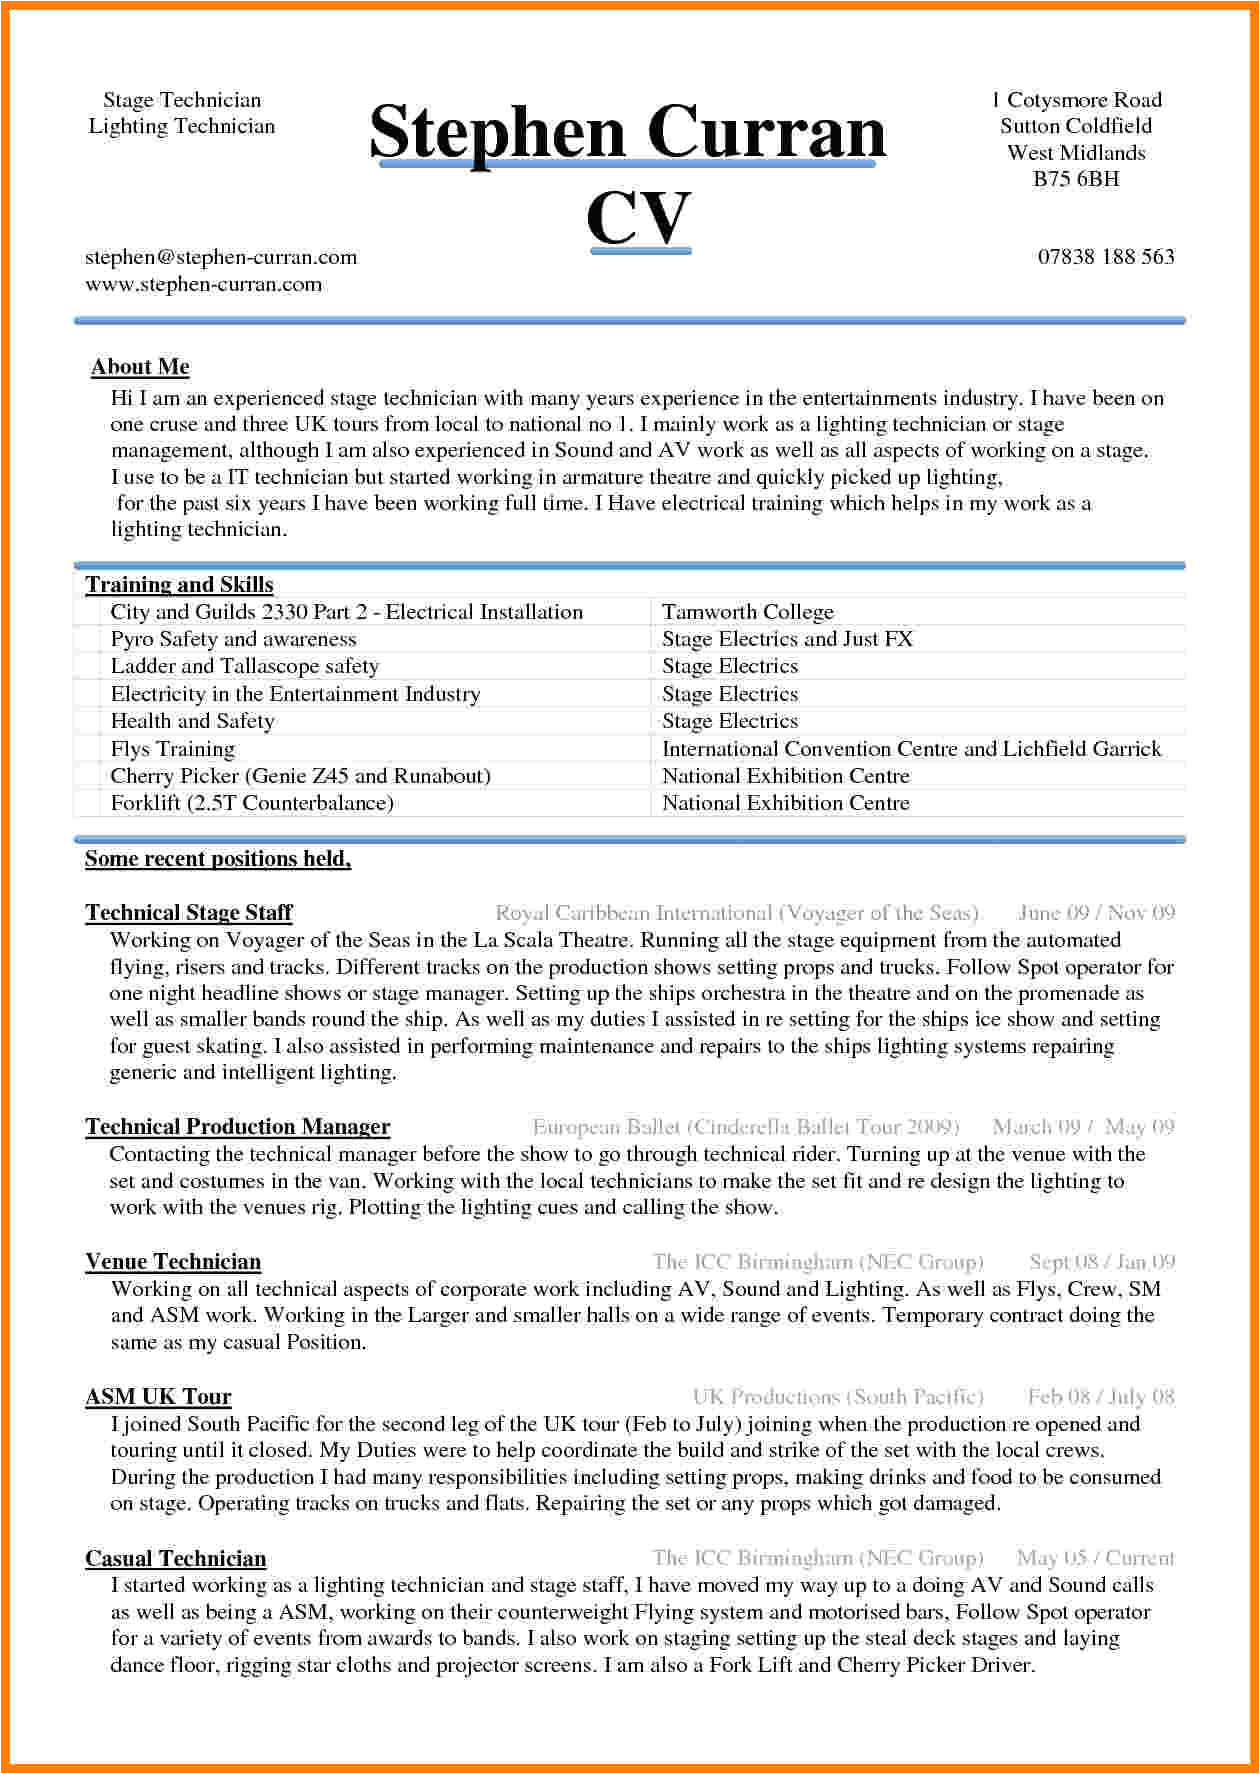 Resume Sample Word Doc 5 Cv Sample Word Document theorynpractice